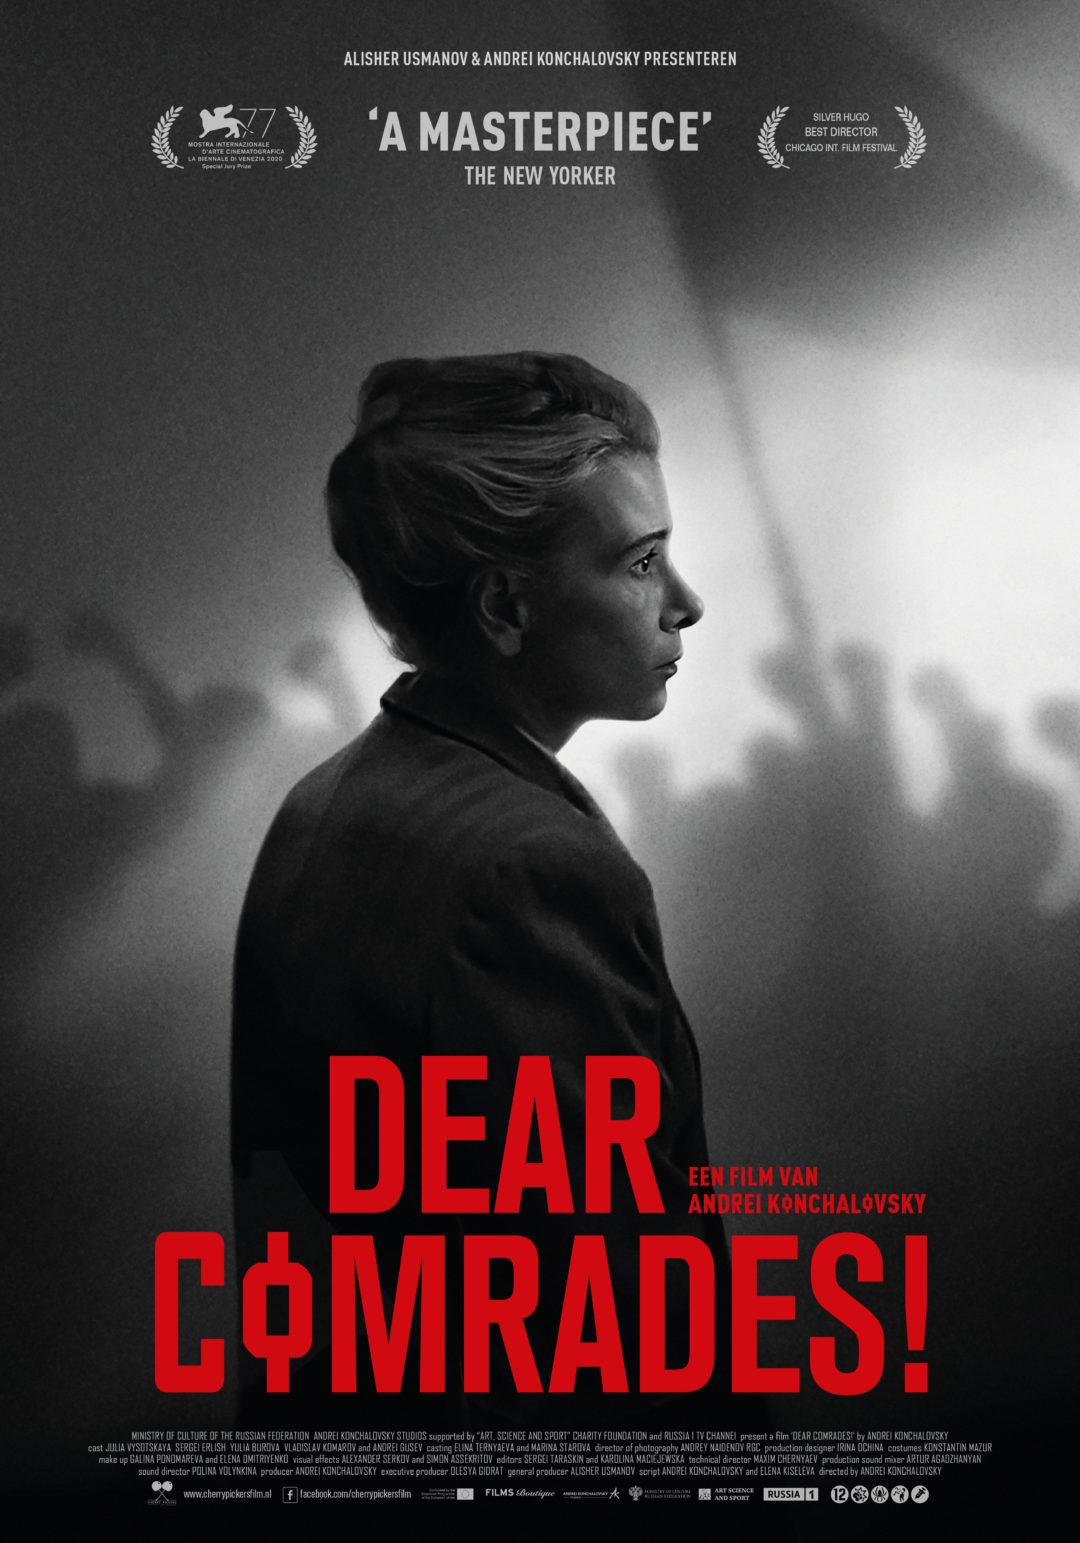 Dear-Comrades-_ps_1_jpg_sd-high.jpg